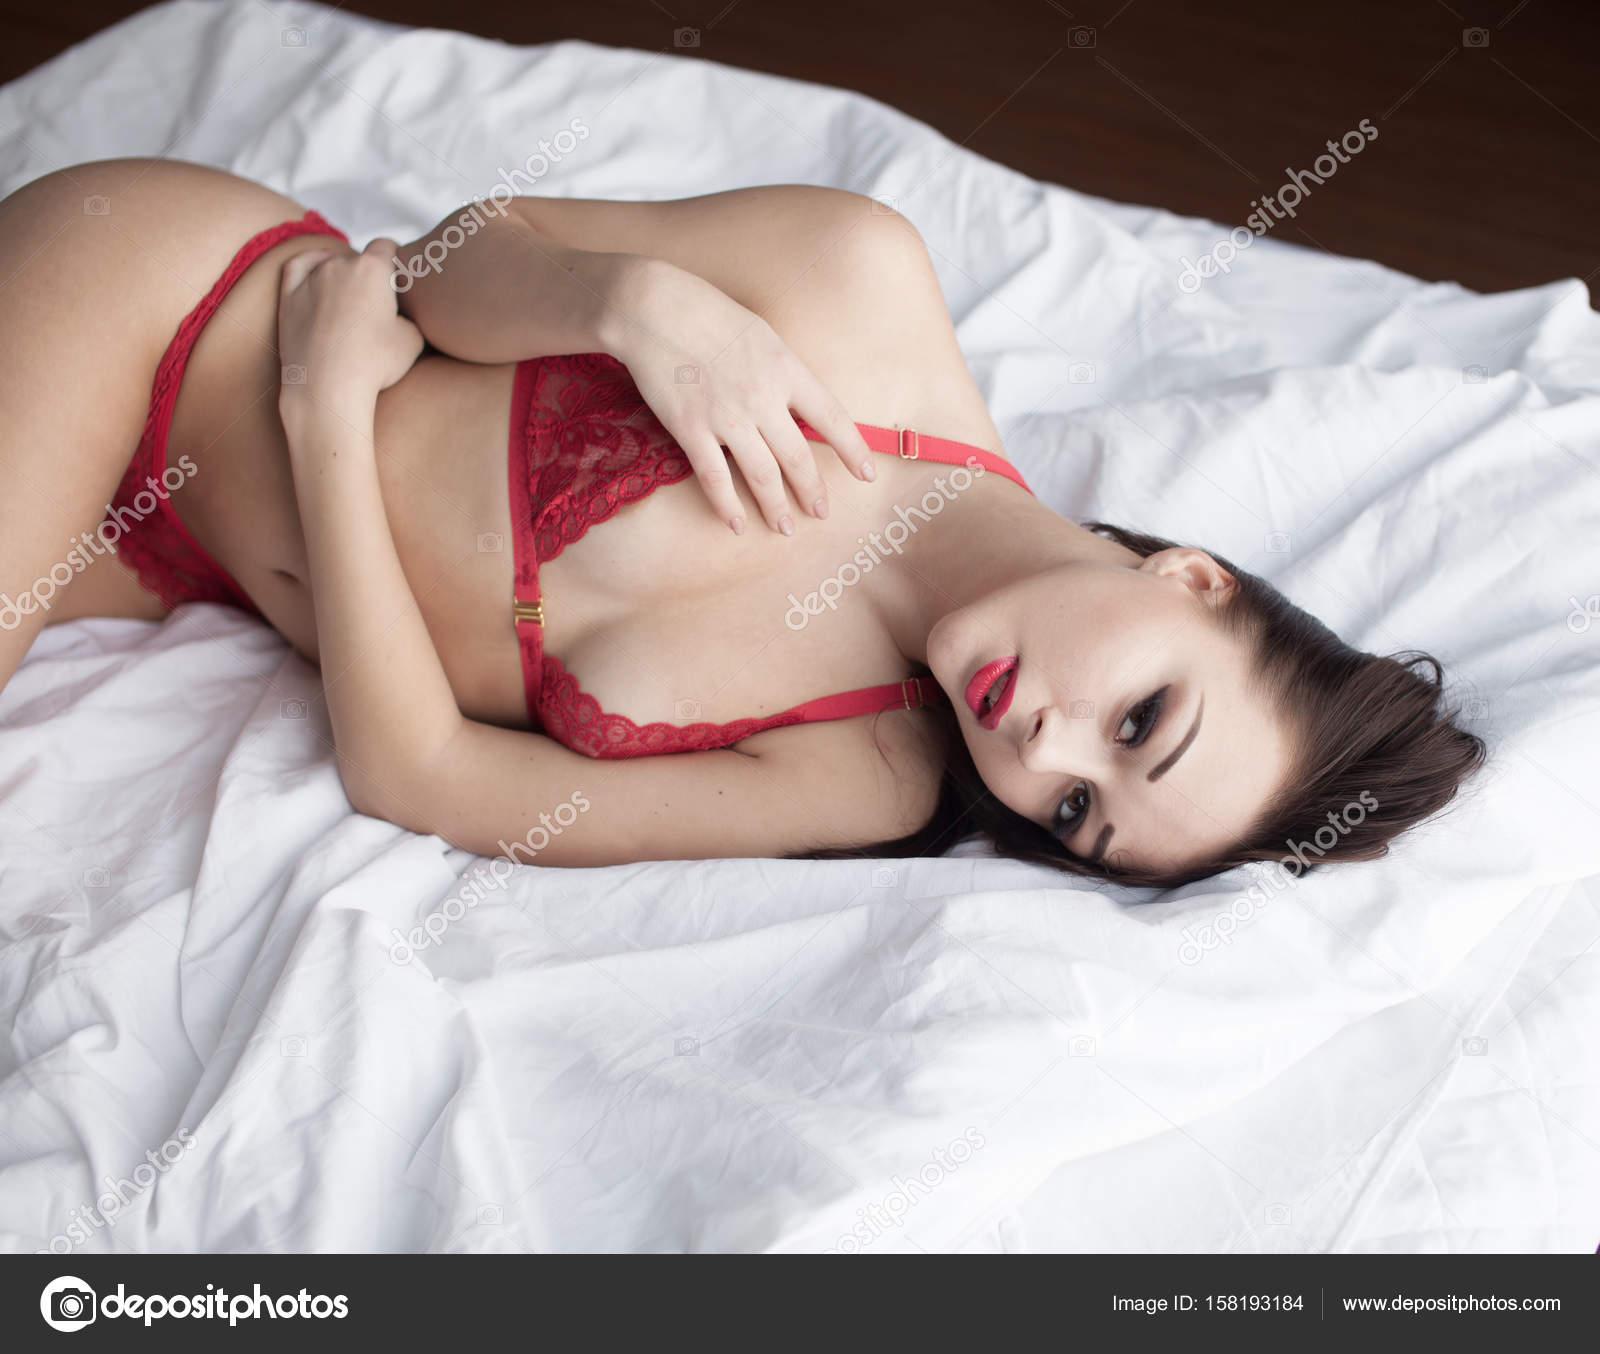 Sexy pics čistá